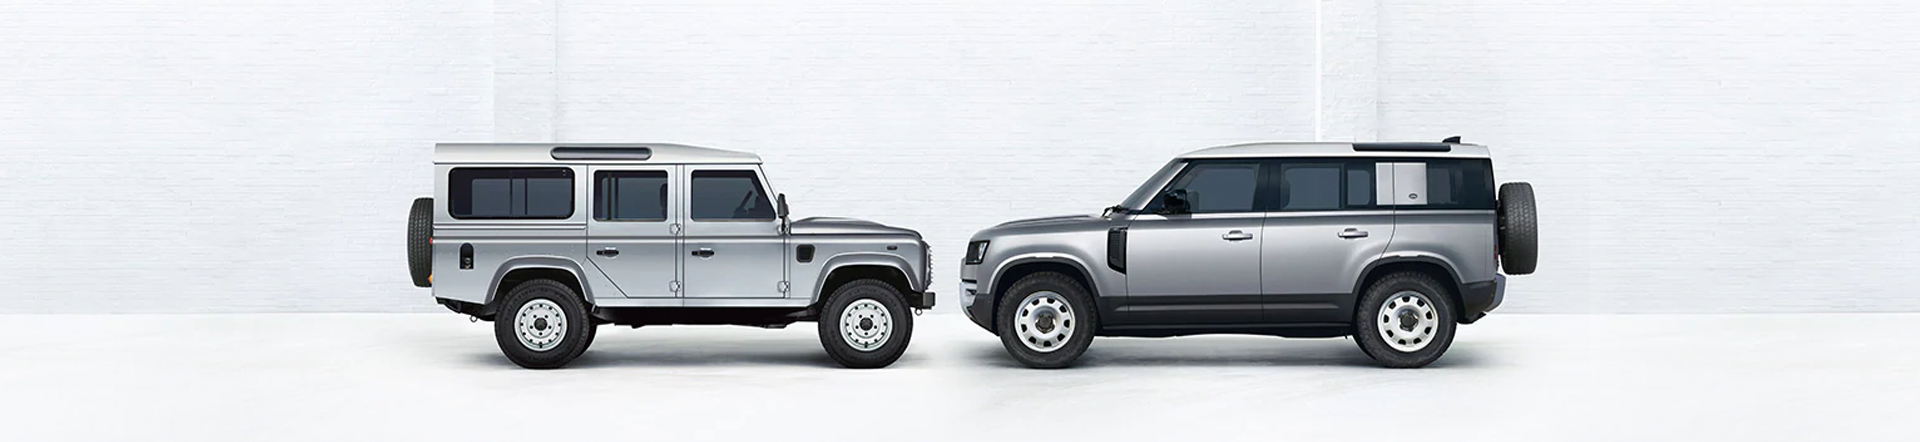 Land Rover Defender Headerbild